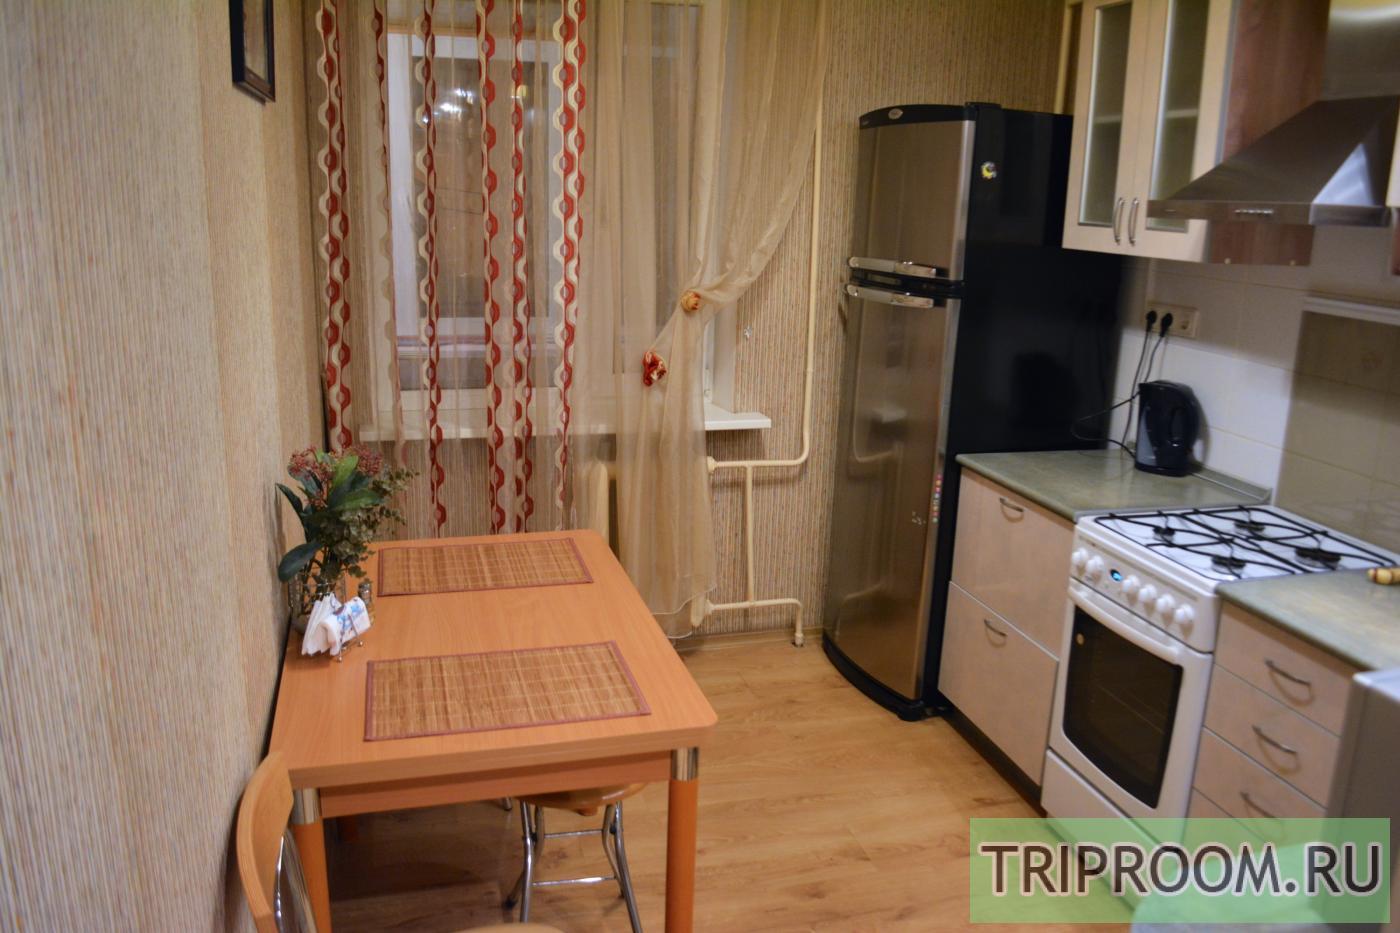 1-комнатная квартира посуточно (вариант № 5487), ул. Кропоткина улица, фото № 6